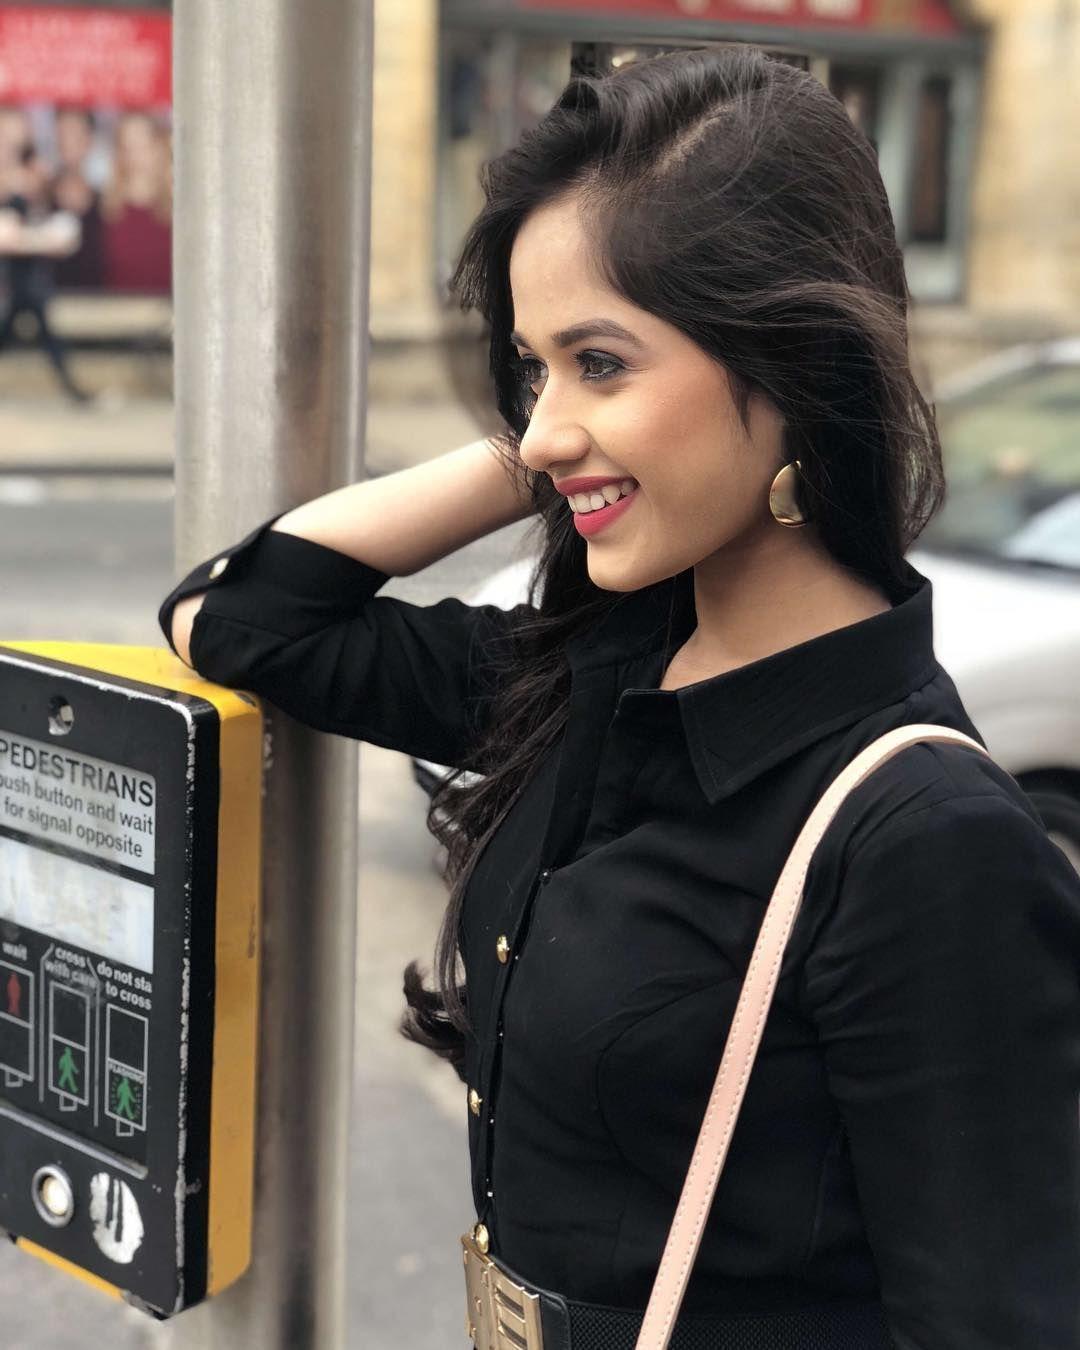 Jannat zubair pink dress  Pin by anjali Ngangbam on Lovely  Pinterest  TVs Teen and Instagram